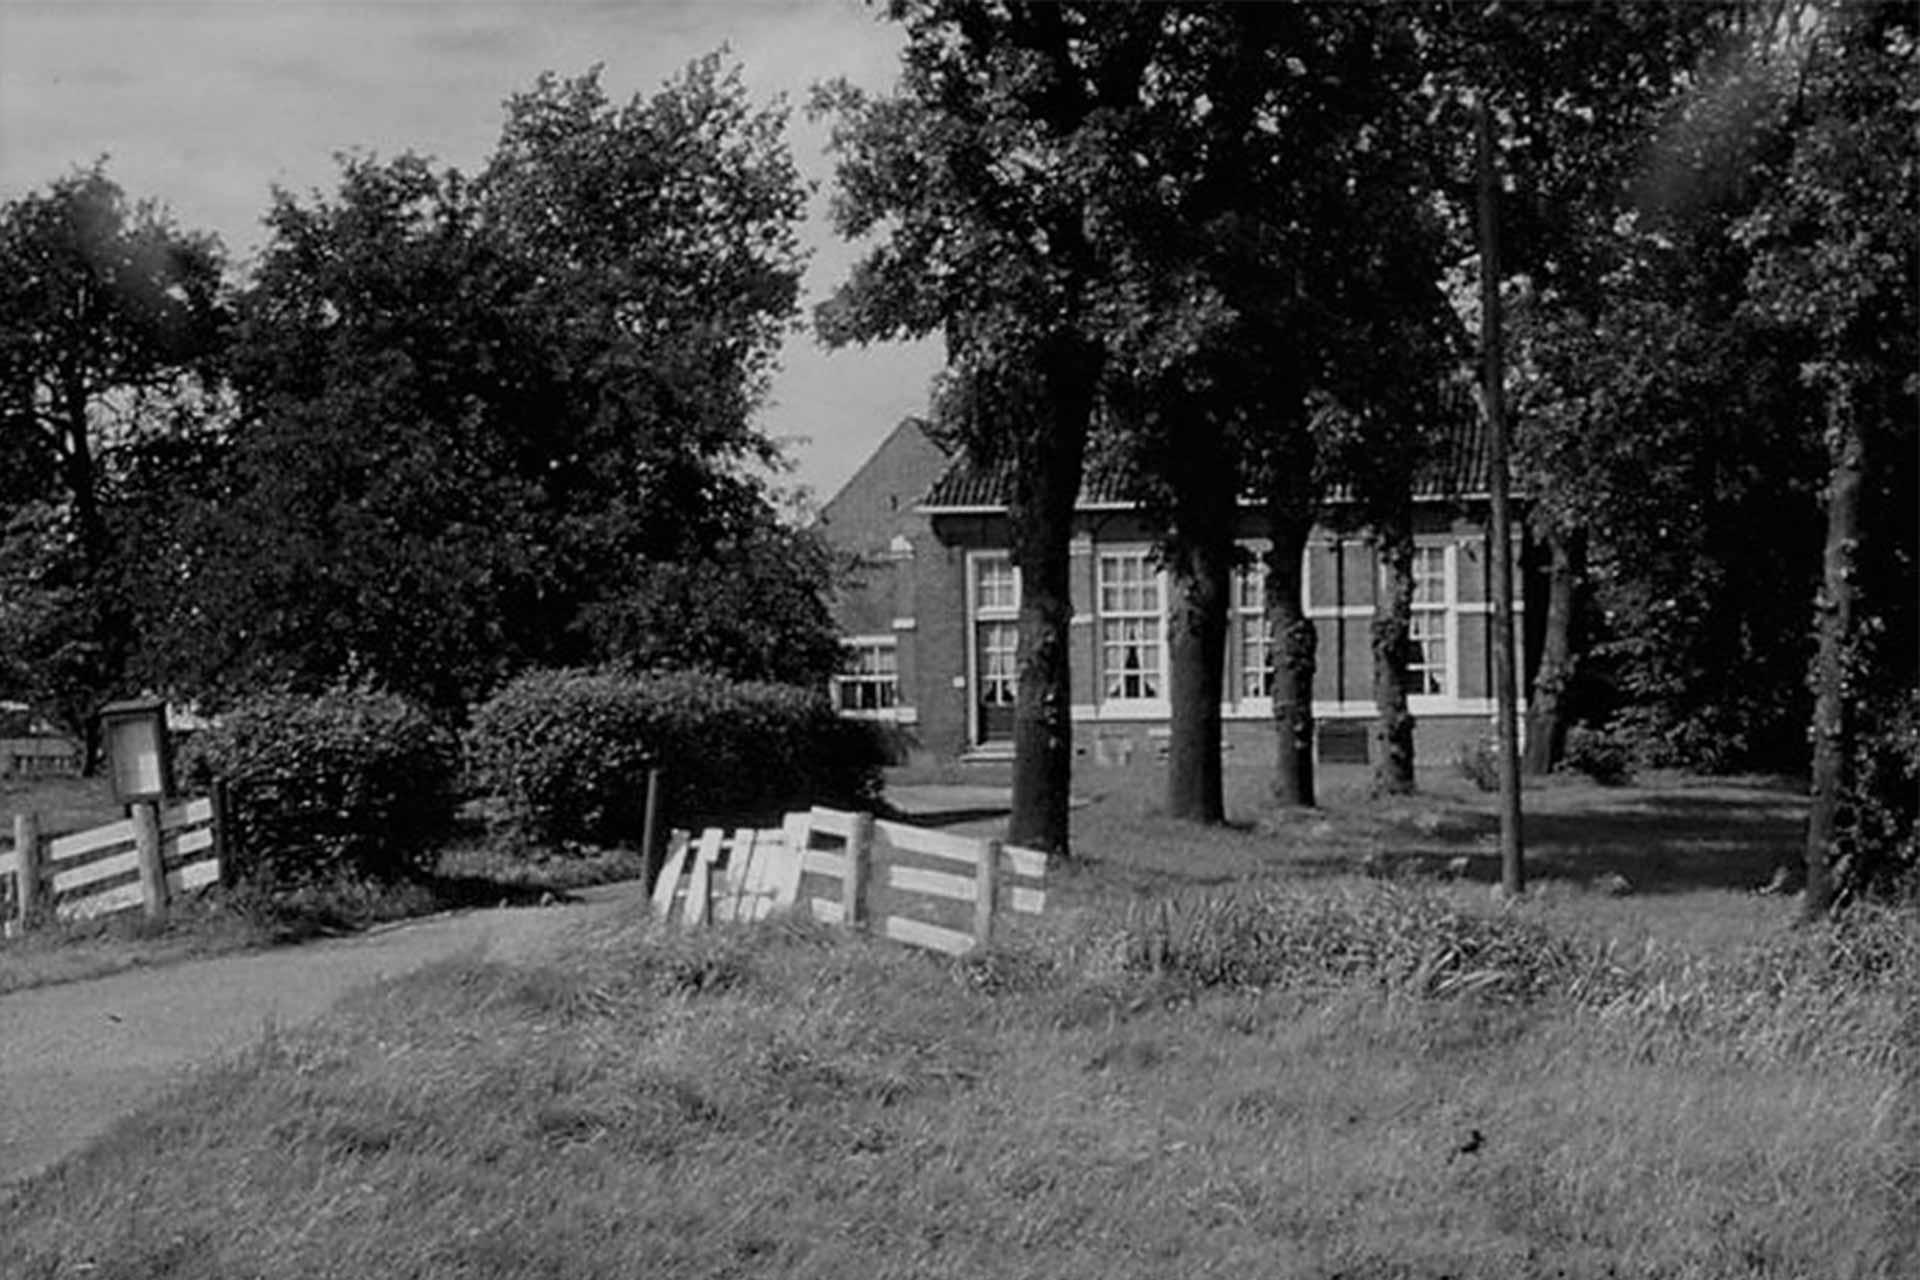 De-Hofboerderij-oud-in-zwart-wit_1920x1280-96ppi